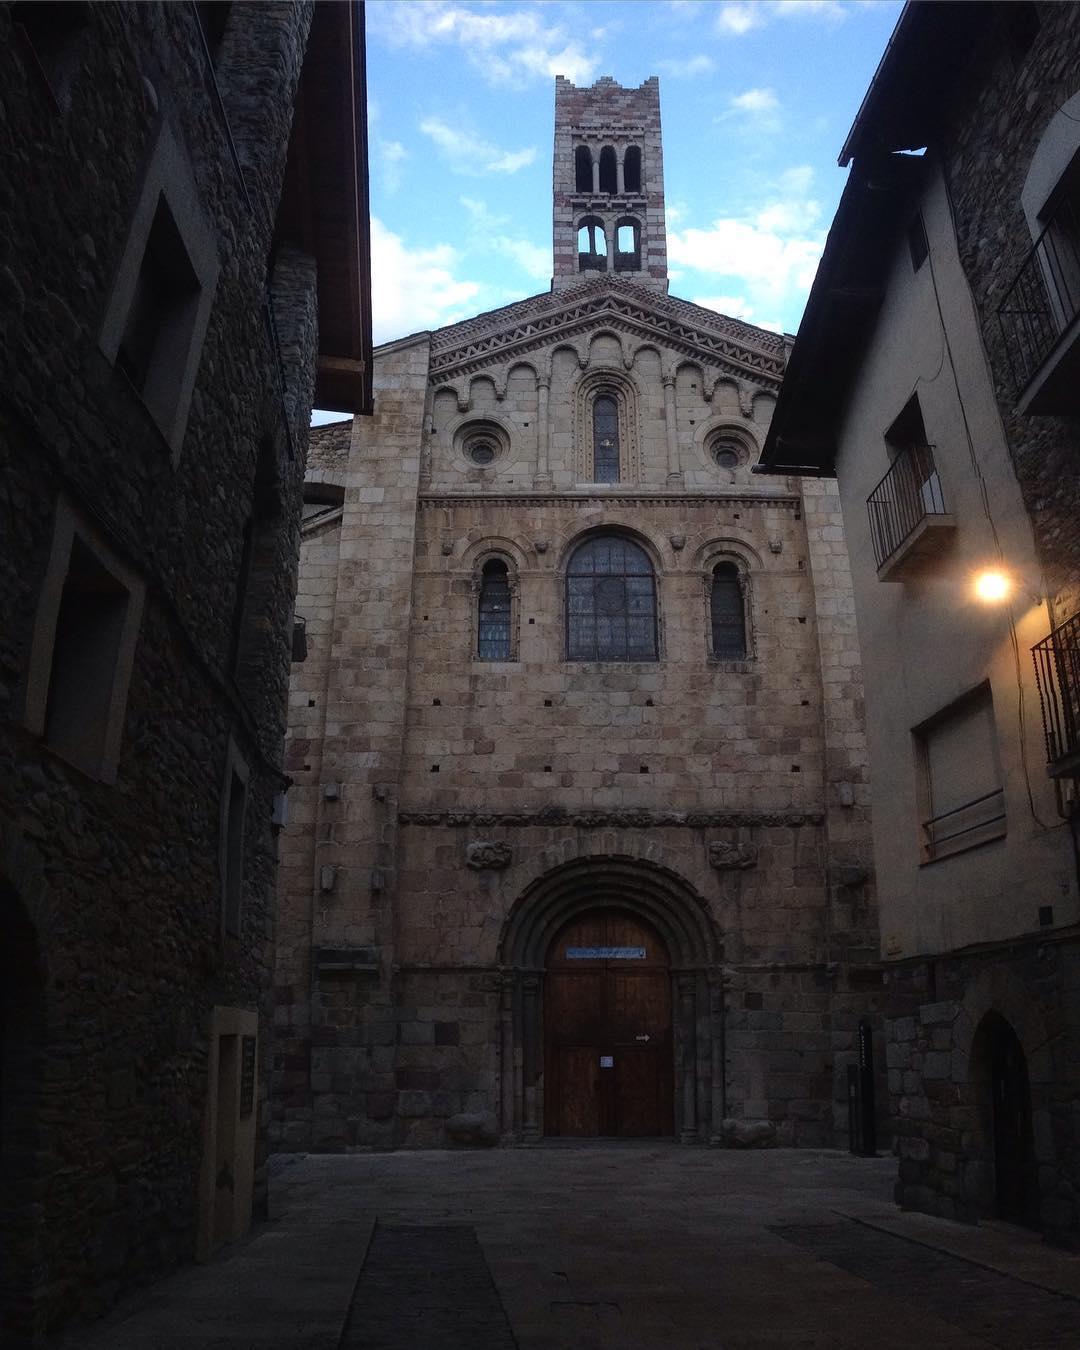 Paseando por Catalunia  Catedral comenzada 1110d.c.